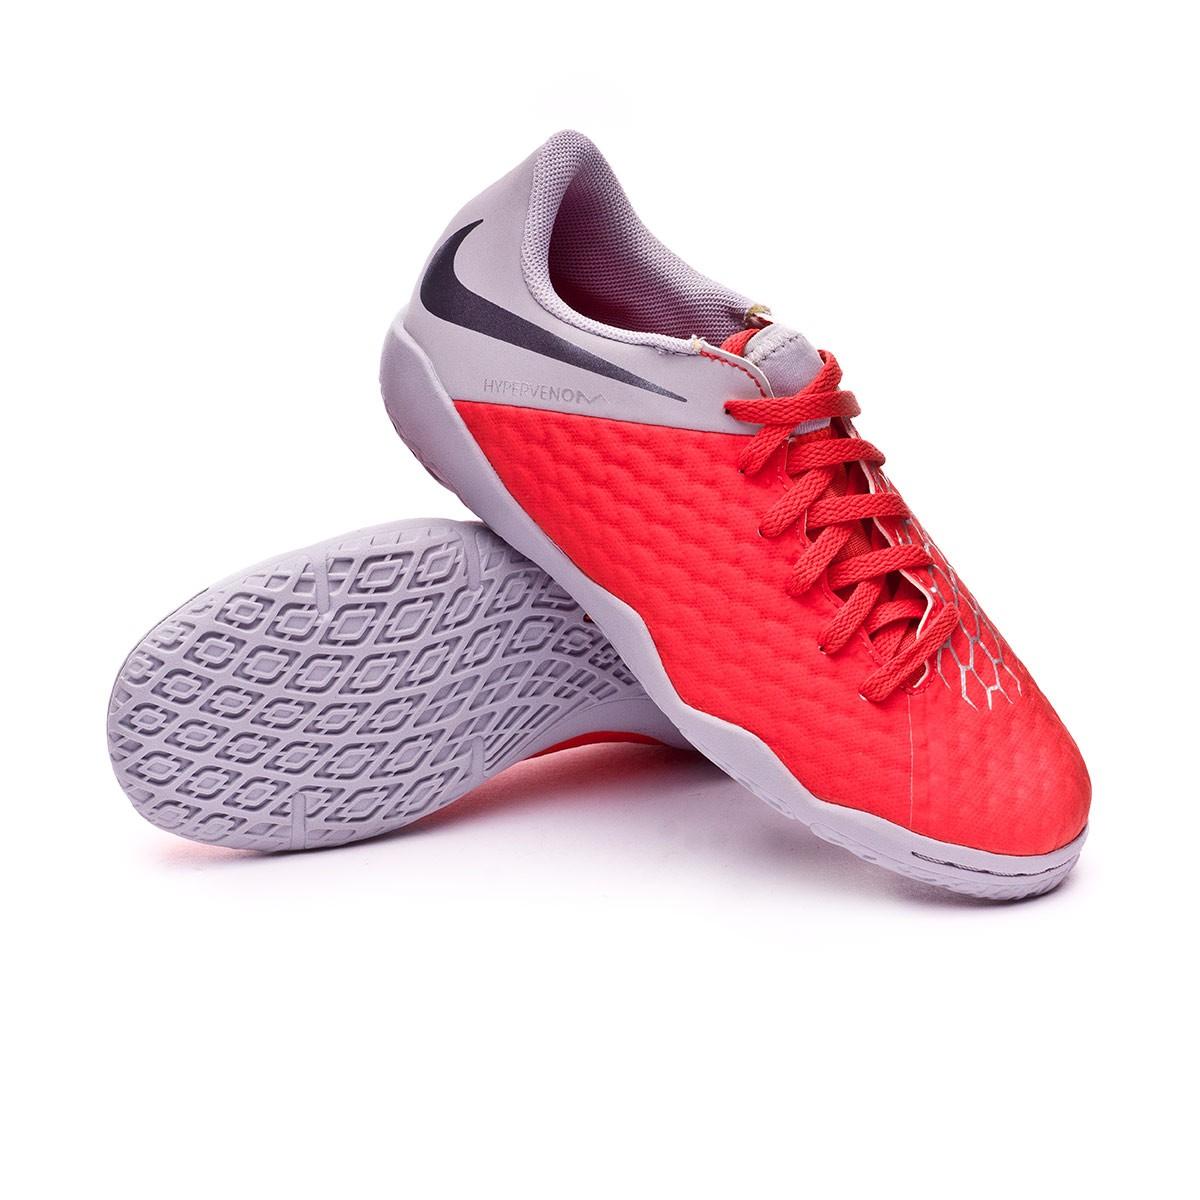 441420da7953 Futsal Boot Nike Kids Hypervenom PhantomX III Academy IC Light ...